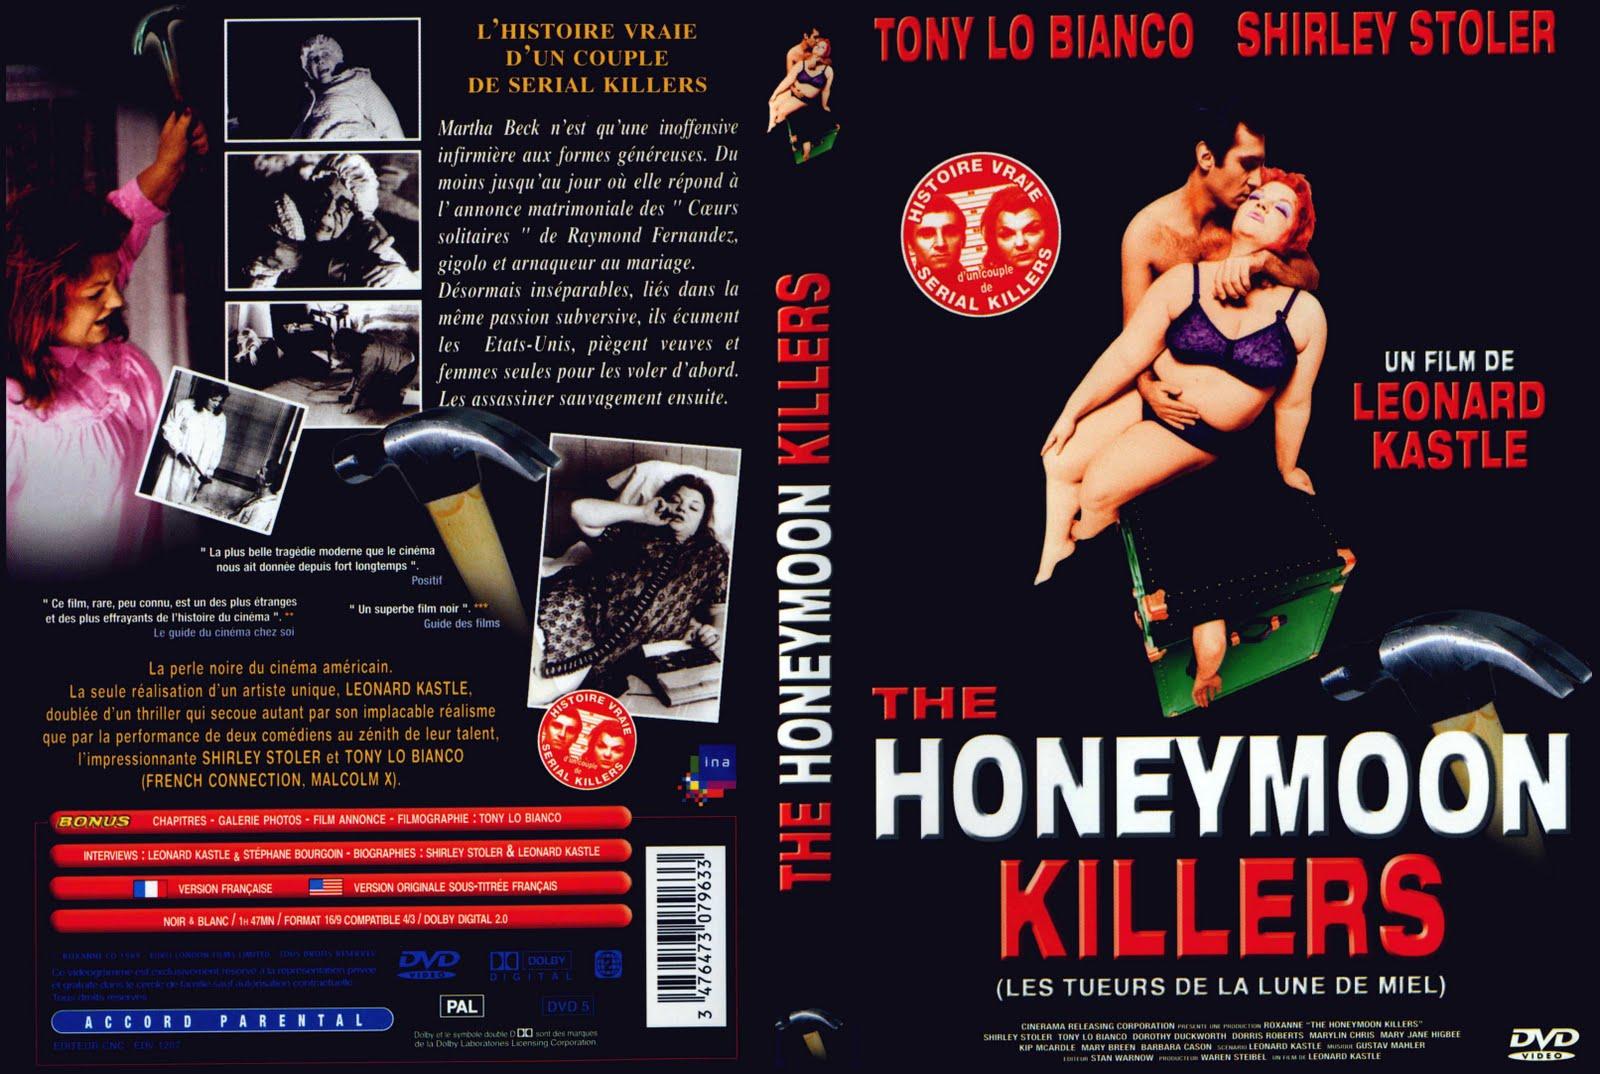 Honeymoon Killers, The - The Honeymoon Killers From Mars